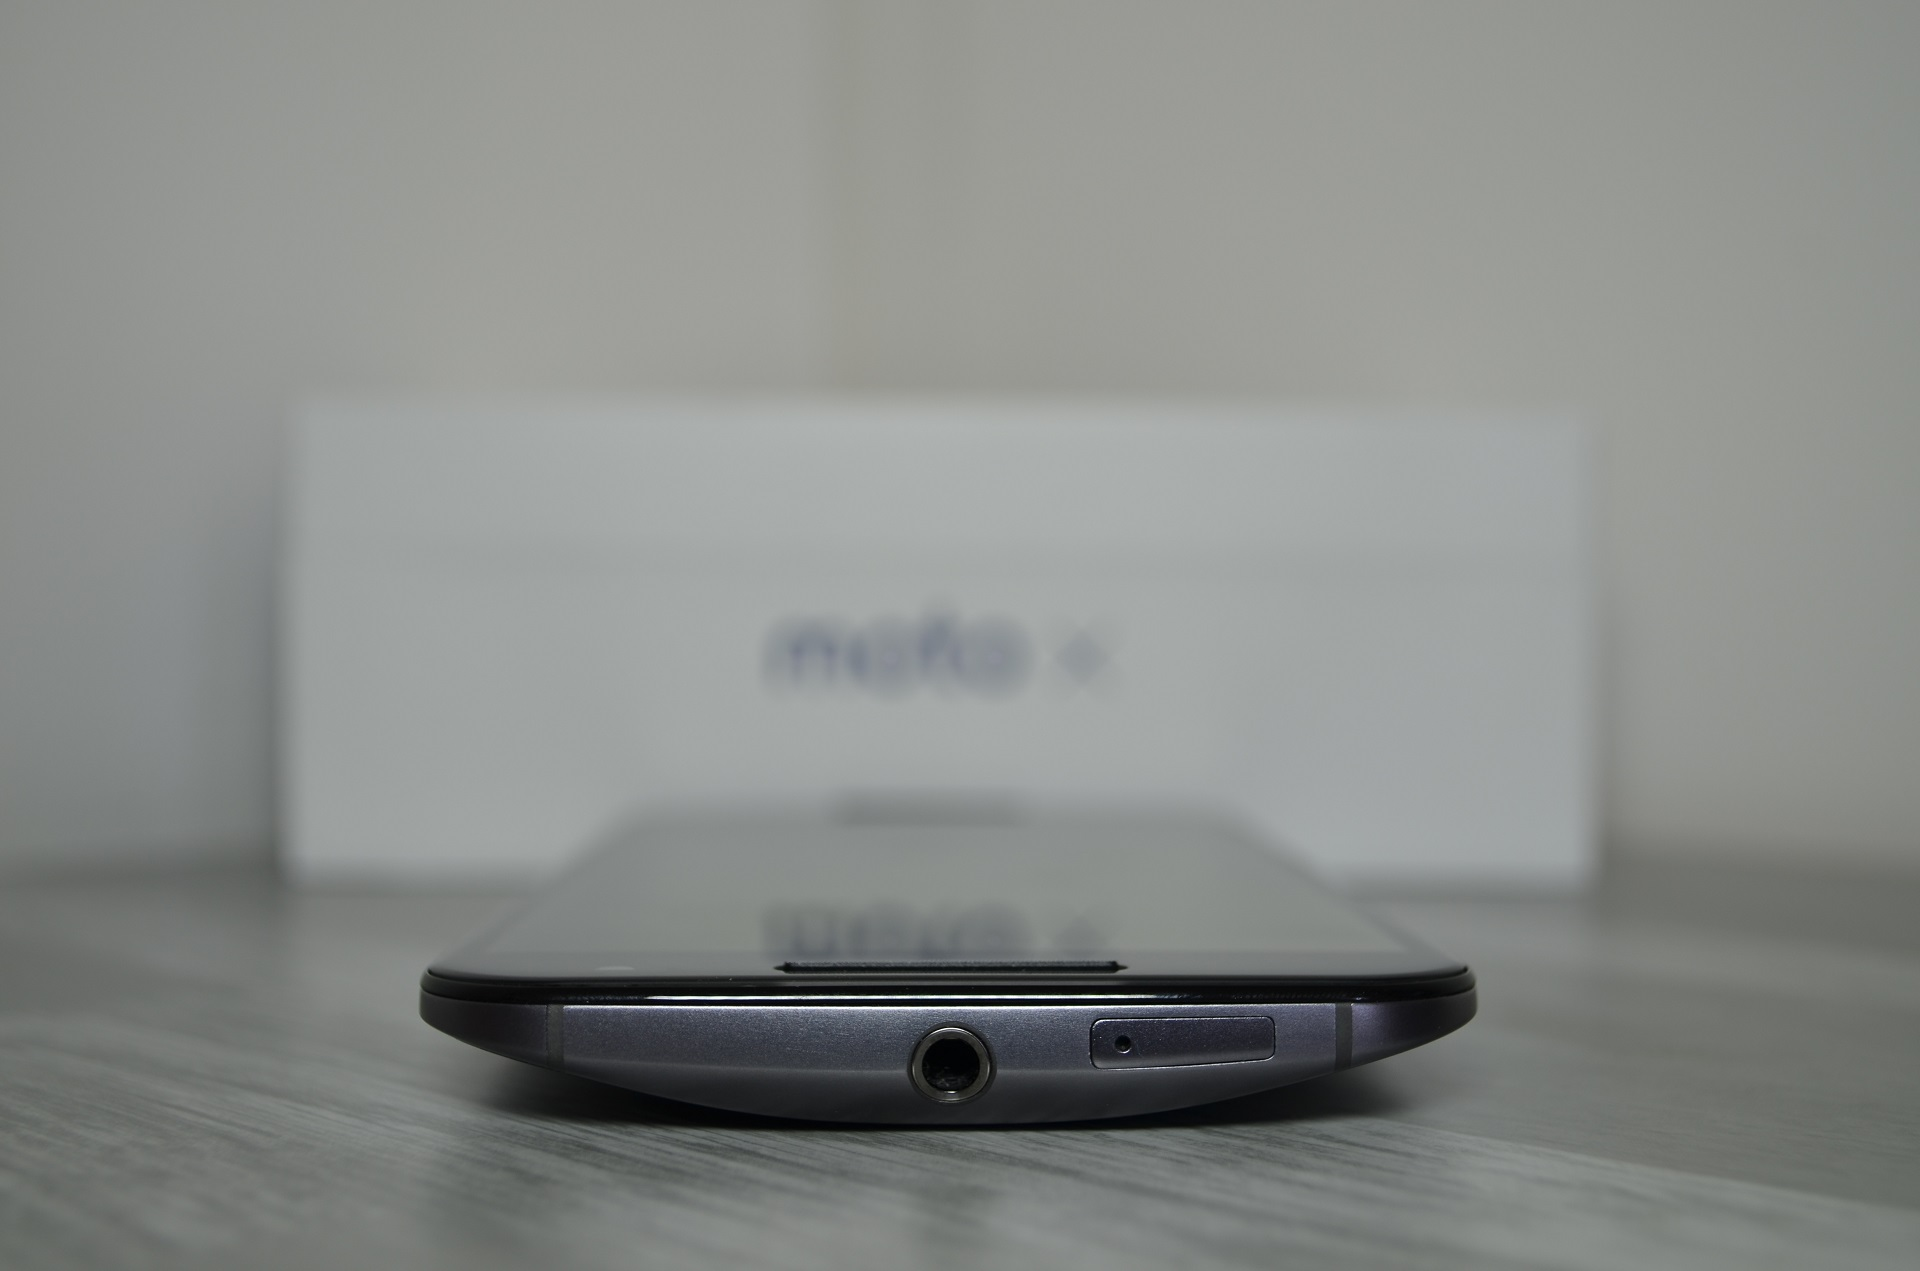 MOTOX_4